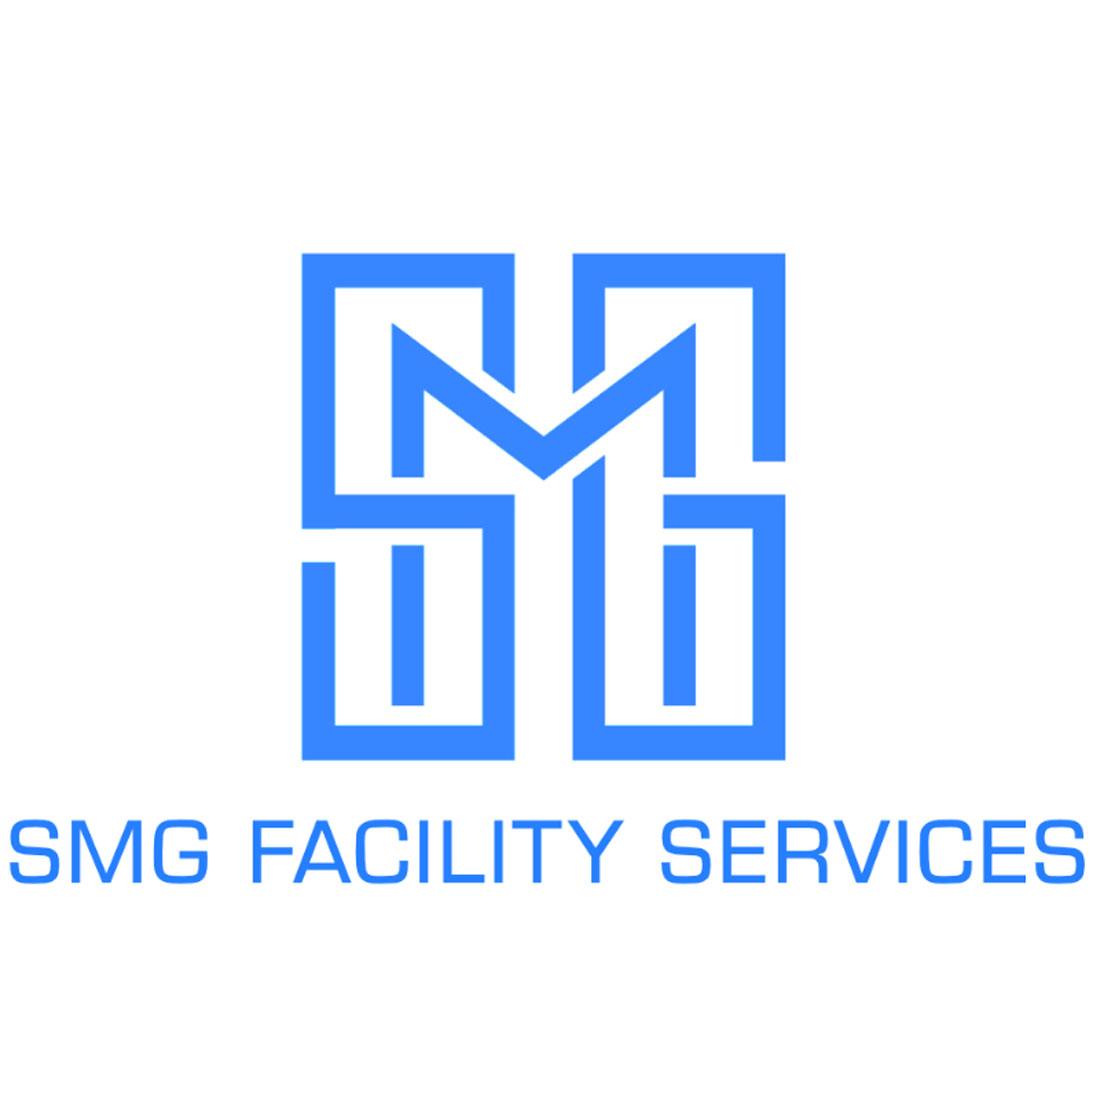 SMG Facility Services